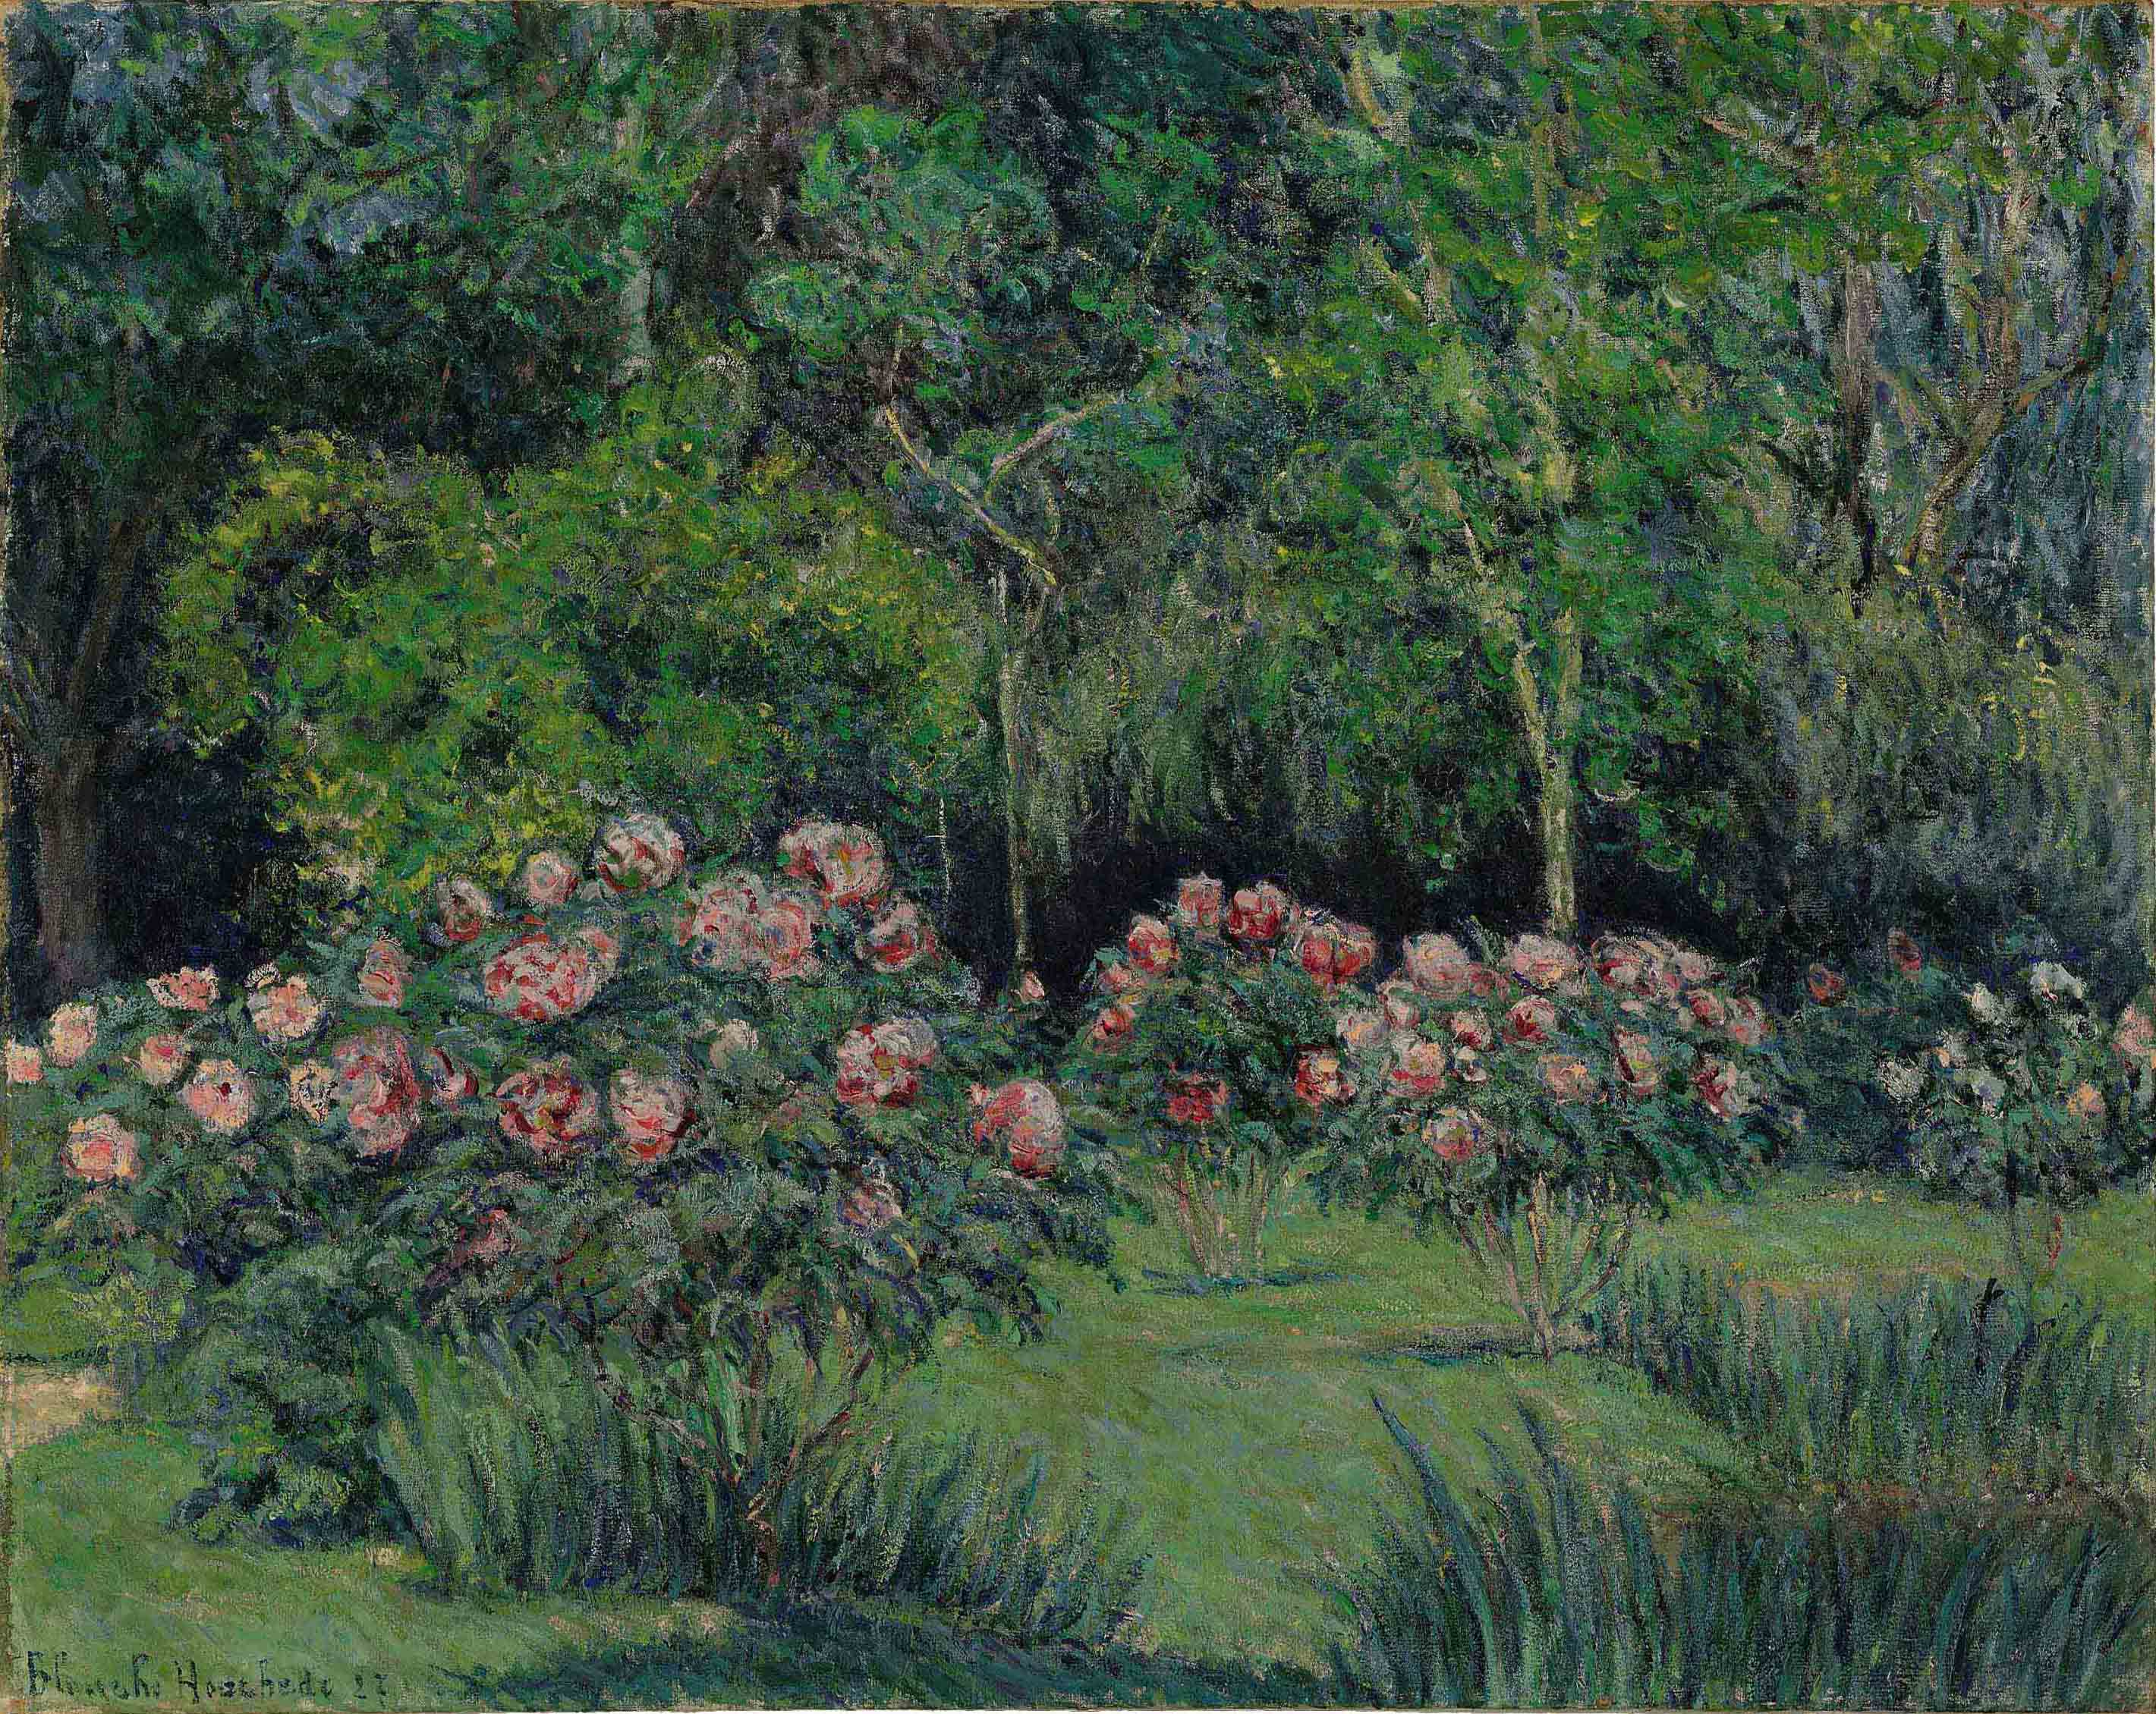 Le jardin à Giverny